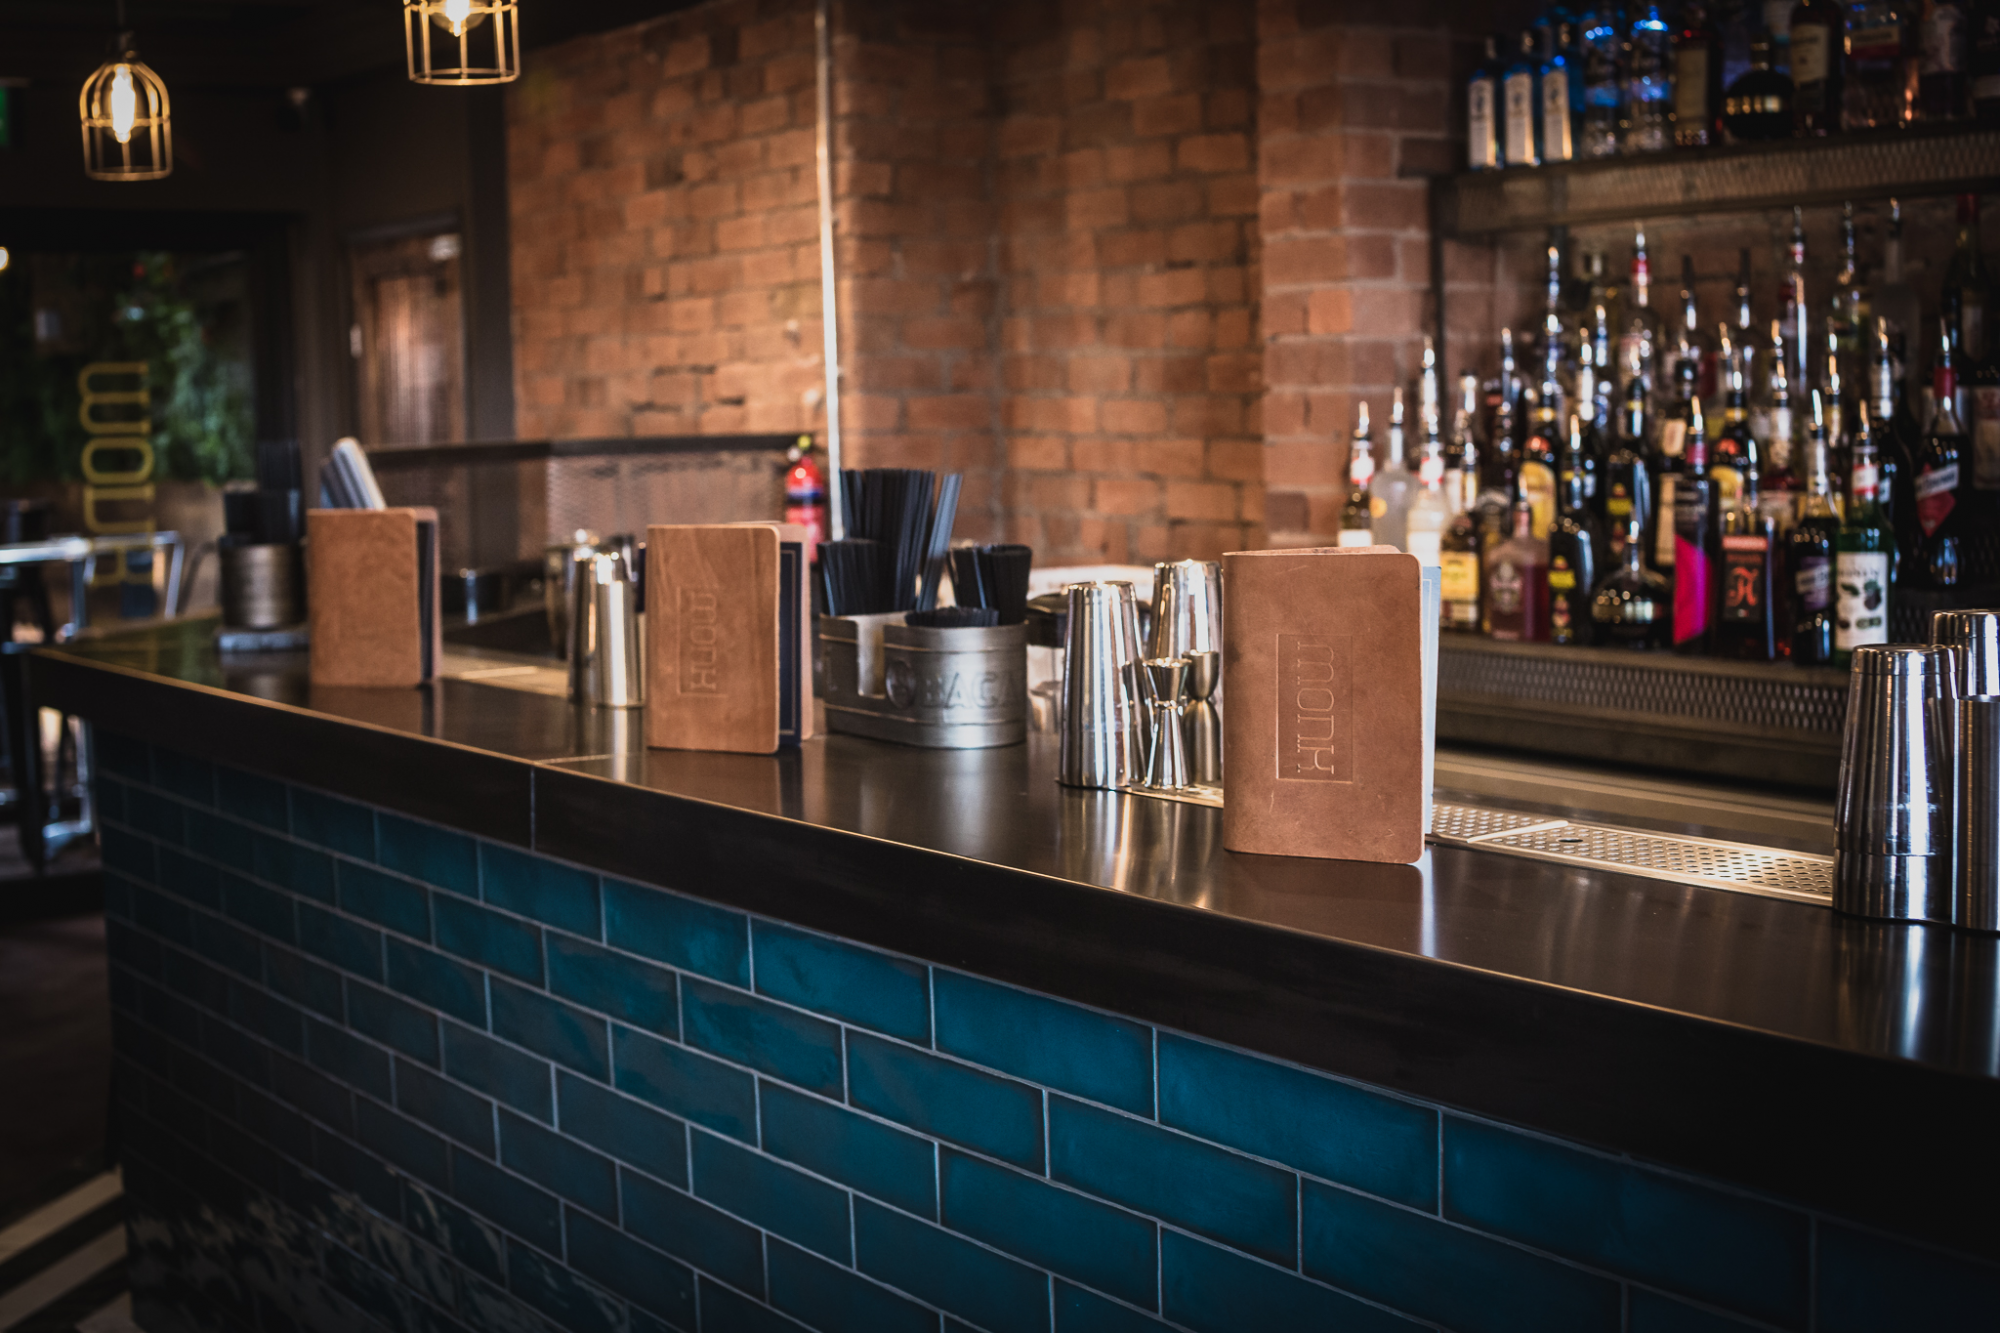 The Monk Bar